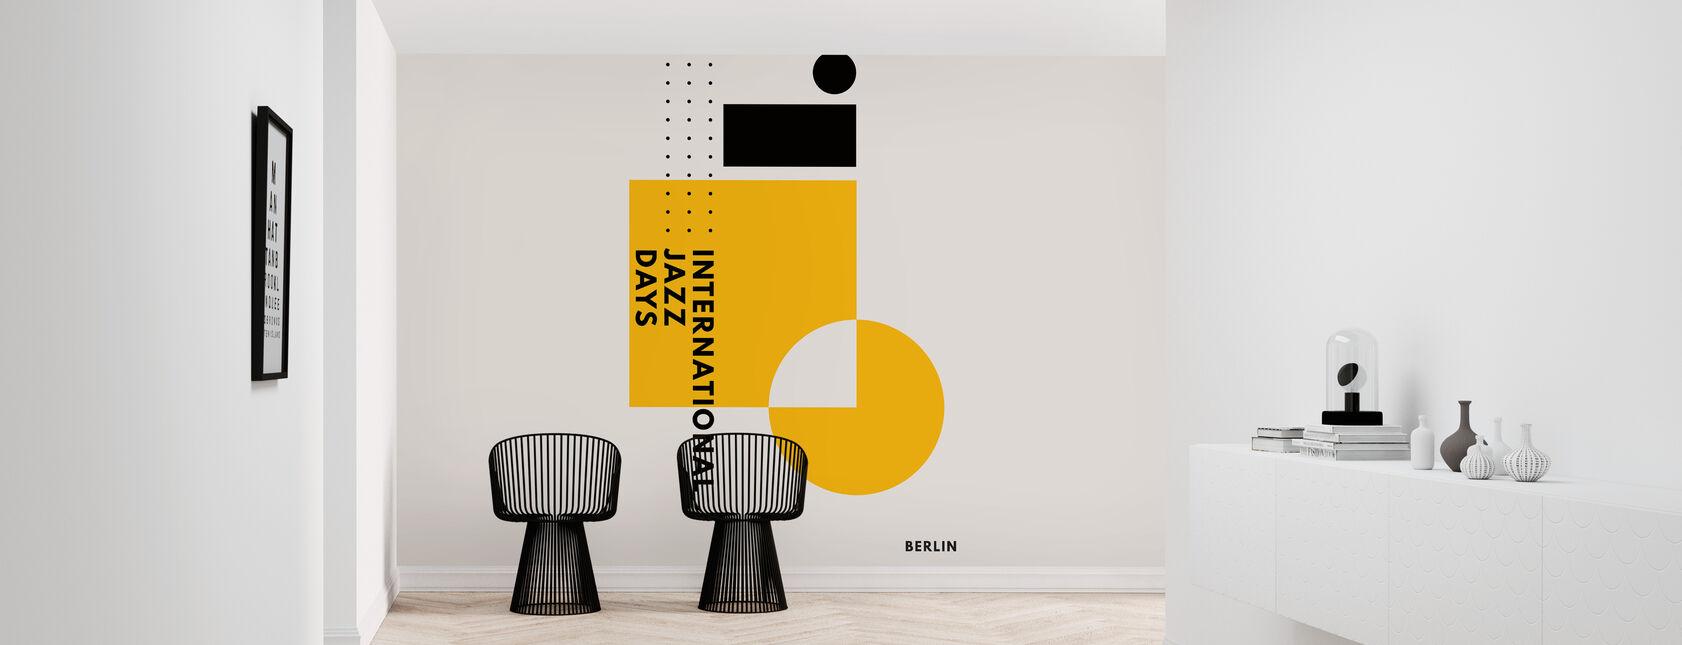 Jazz Days Berlin - Wallpaper - Hallway